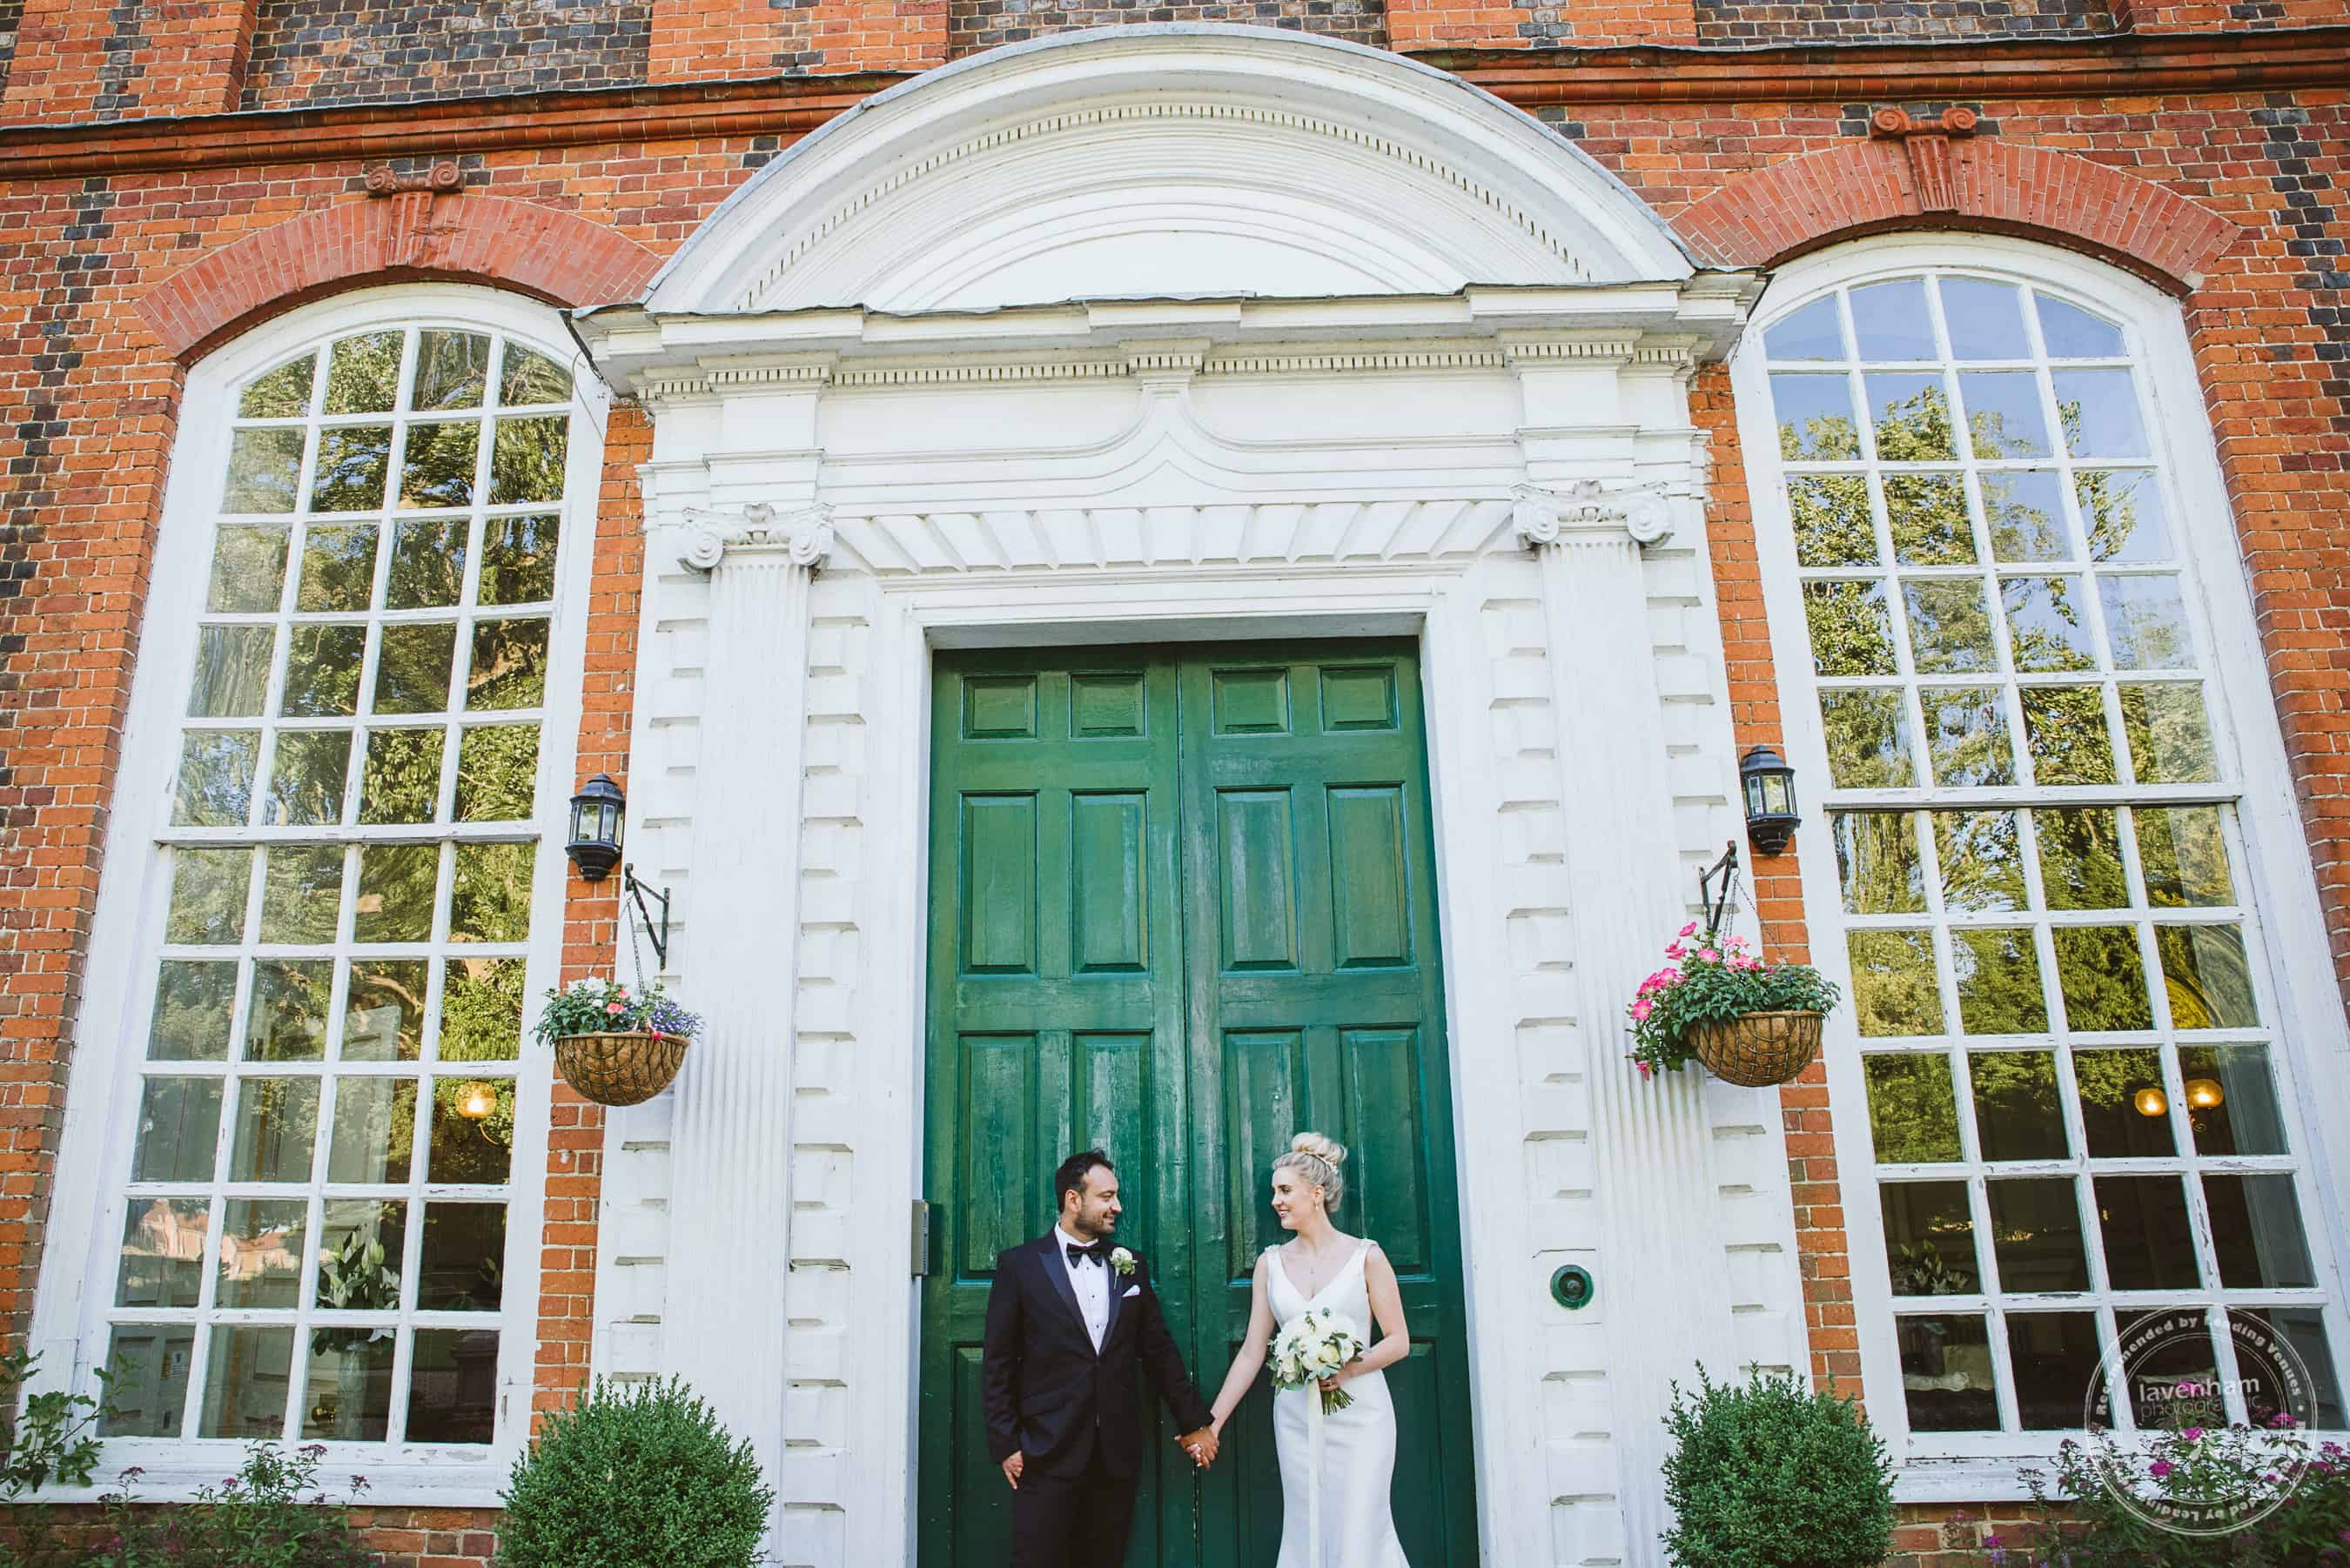 220618 Gosfield Hall Wedding Photography Lavenham Photographic 0160